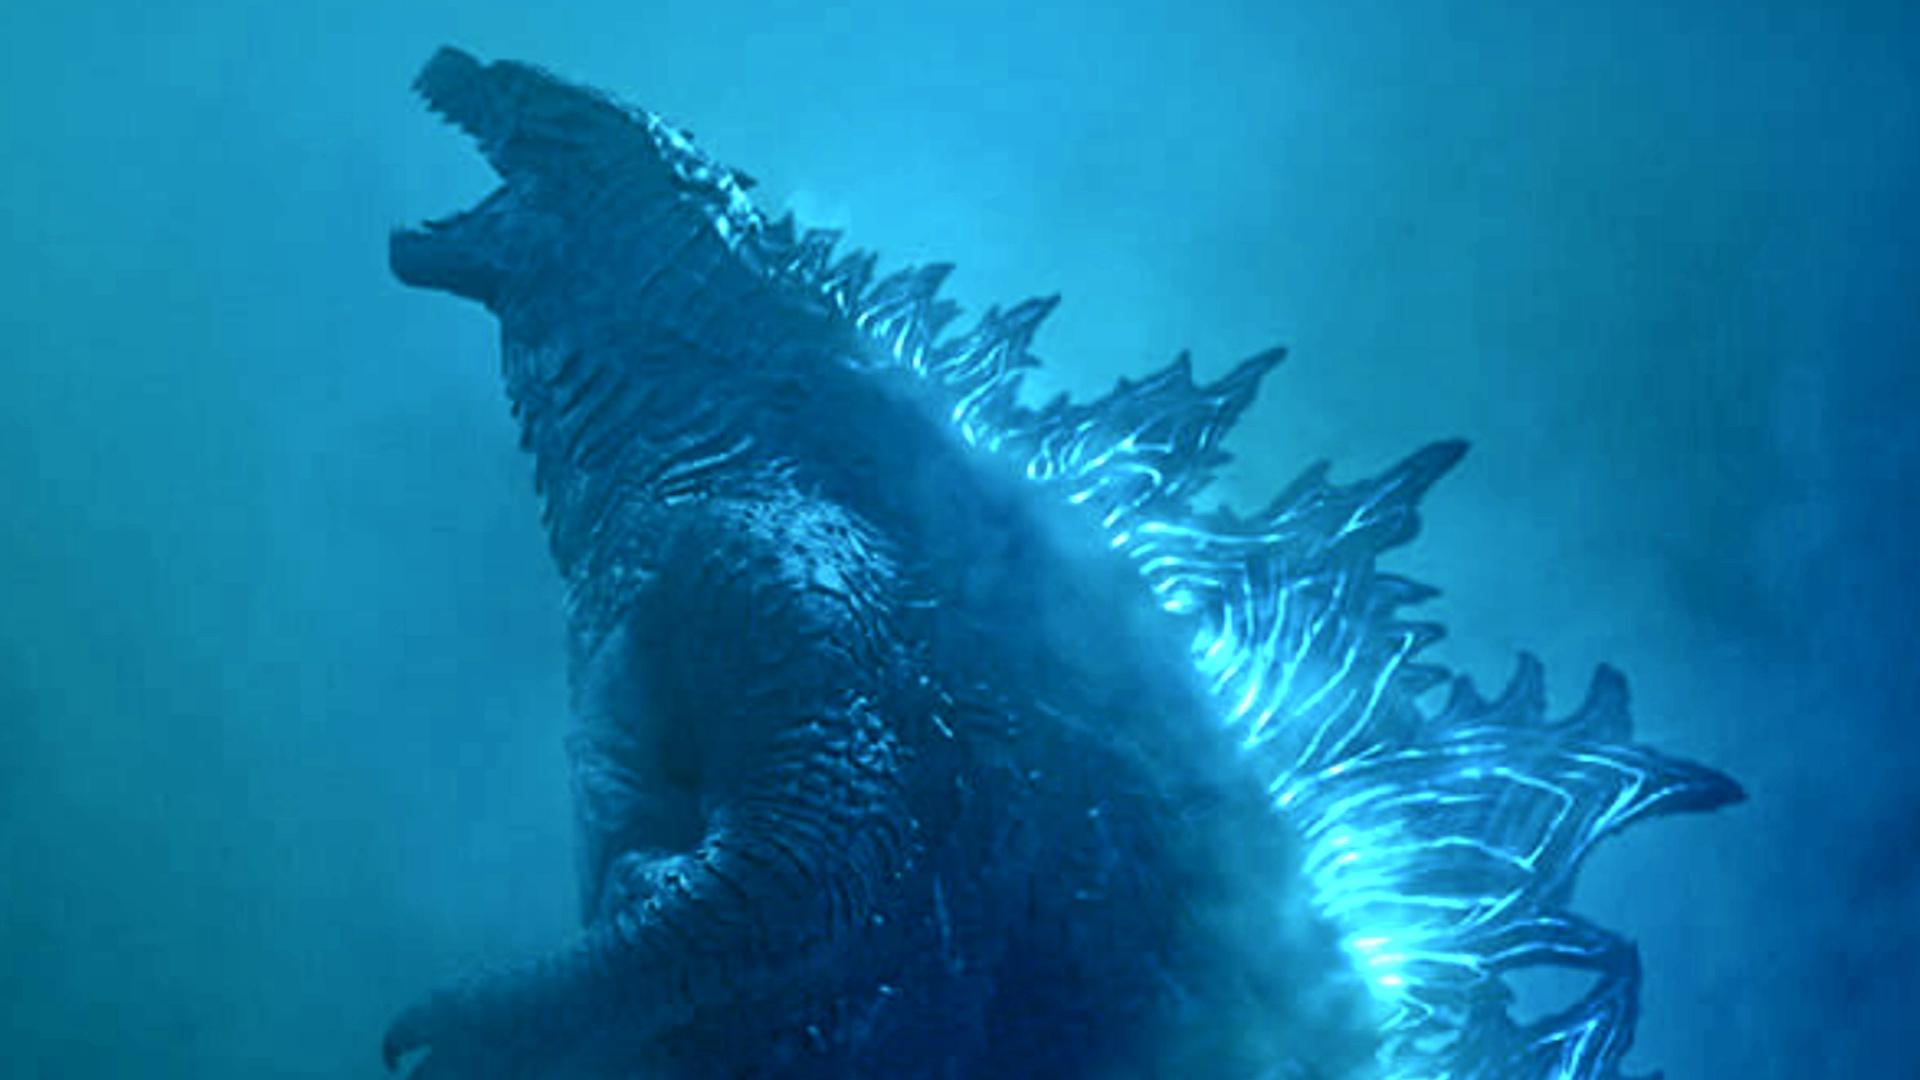 26 Godzilla 2 Wallpapers On Wallpapersafari